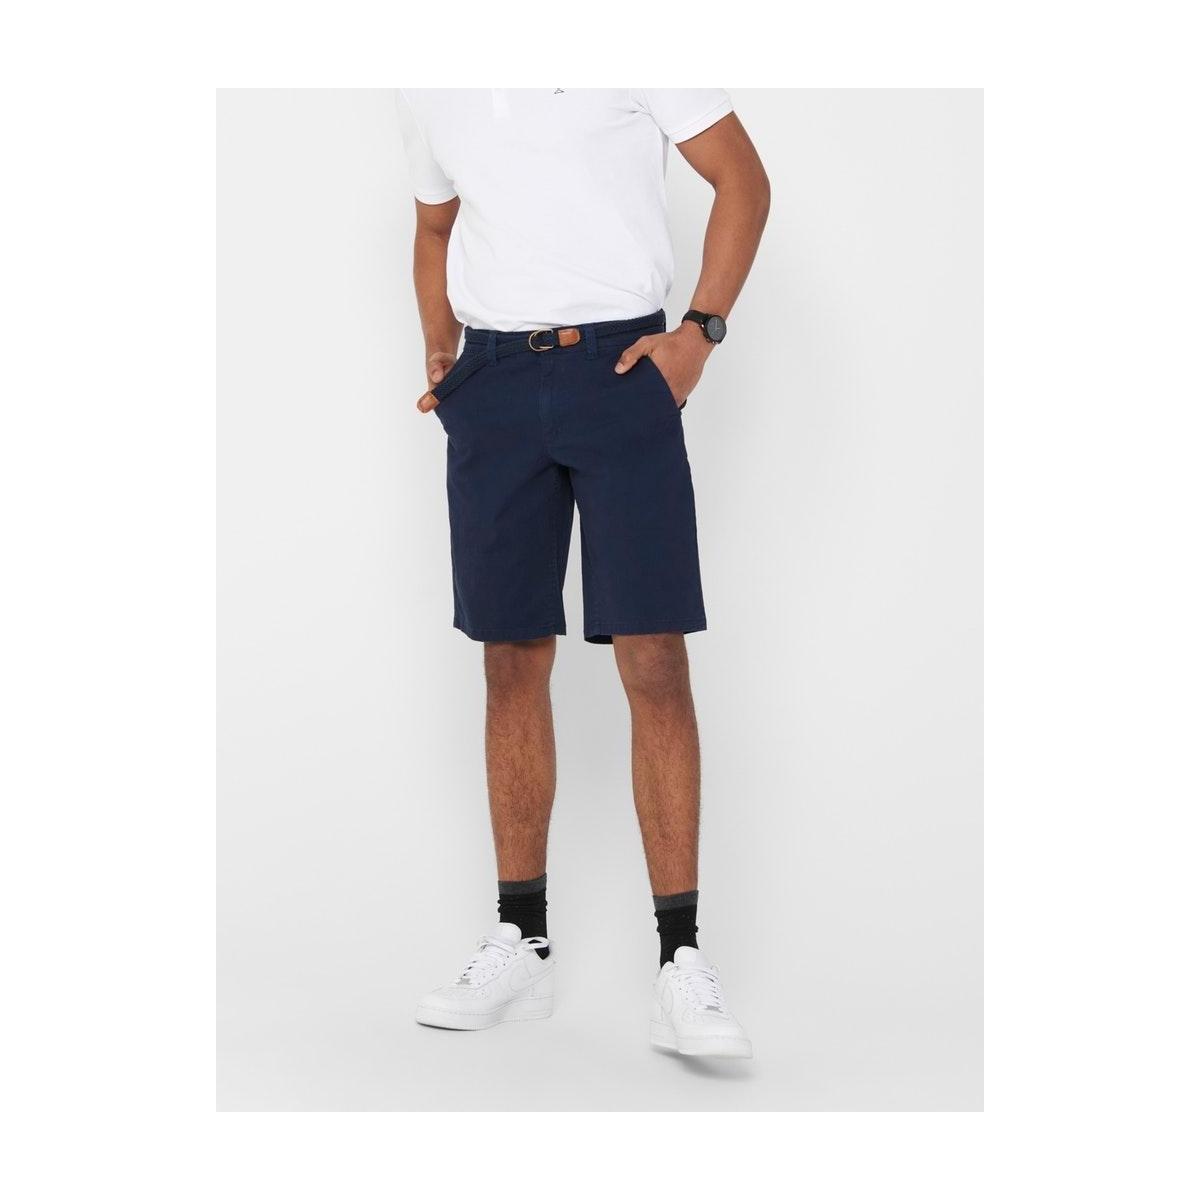 onswill chino shorts belt pk 6557 noos 22016557 only & sons korte broek dress blues